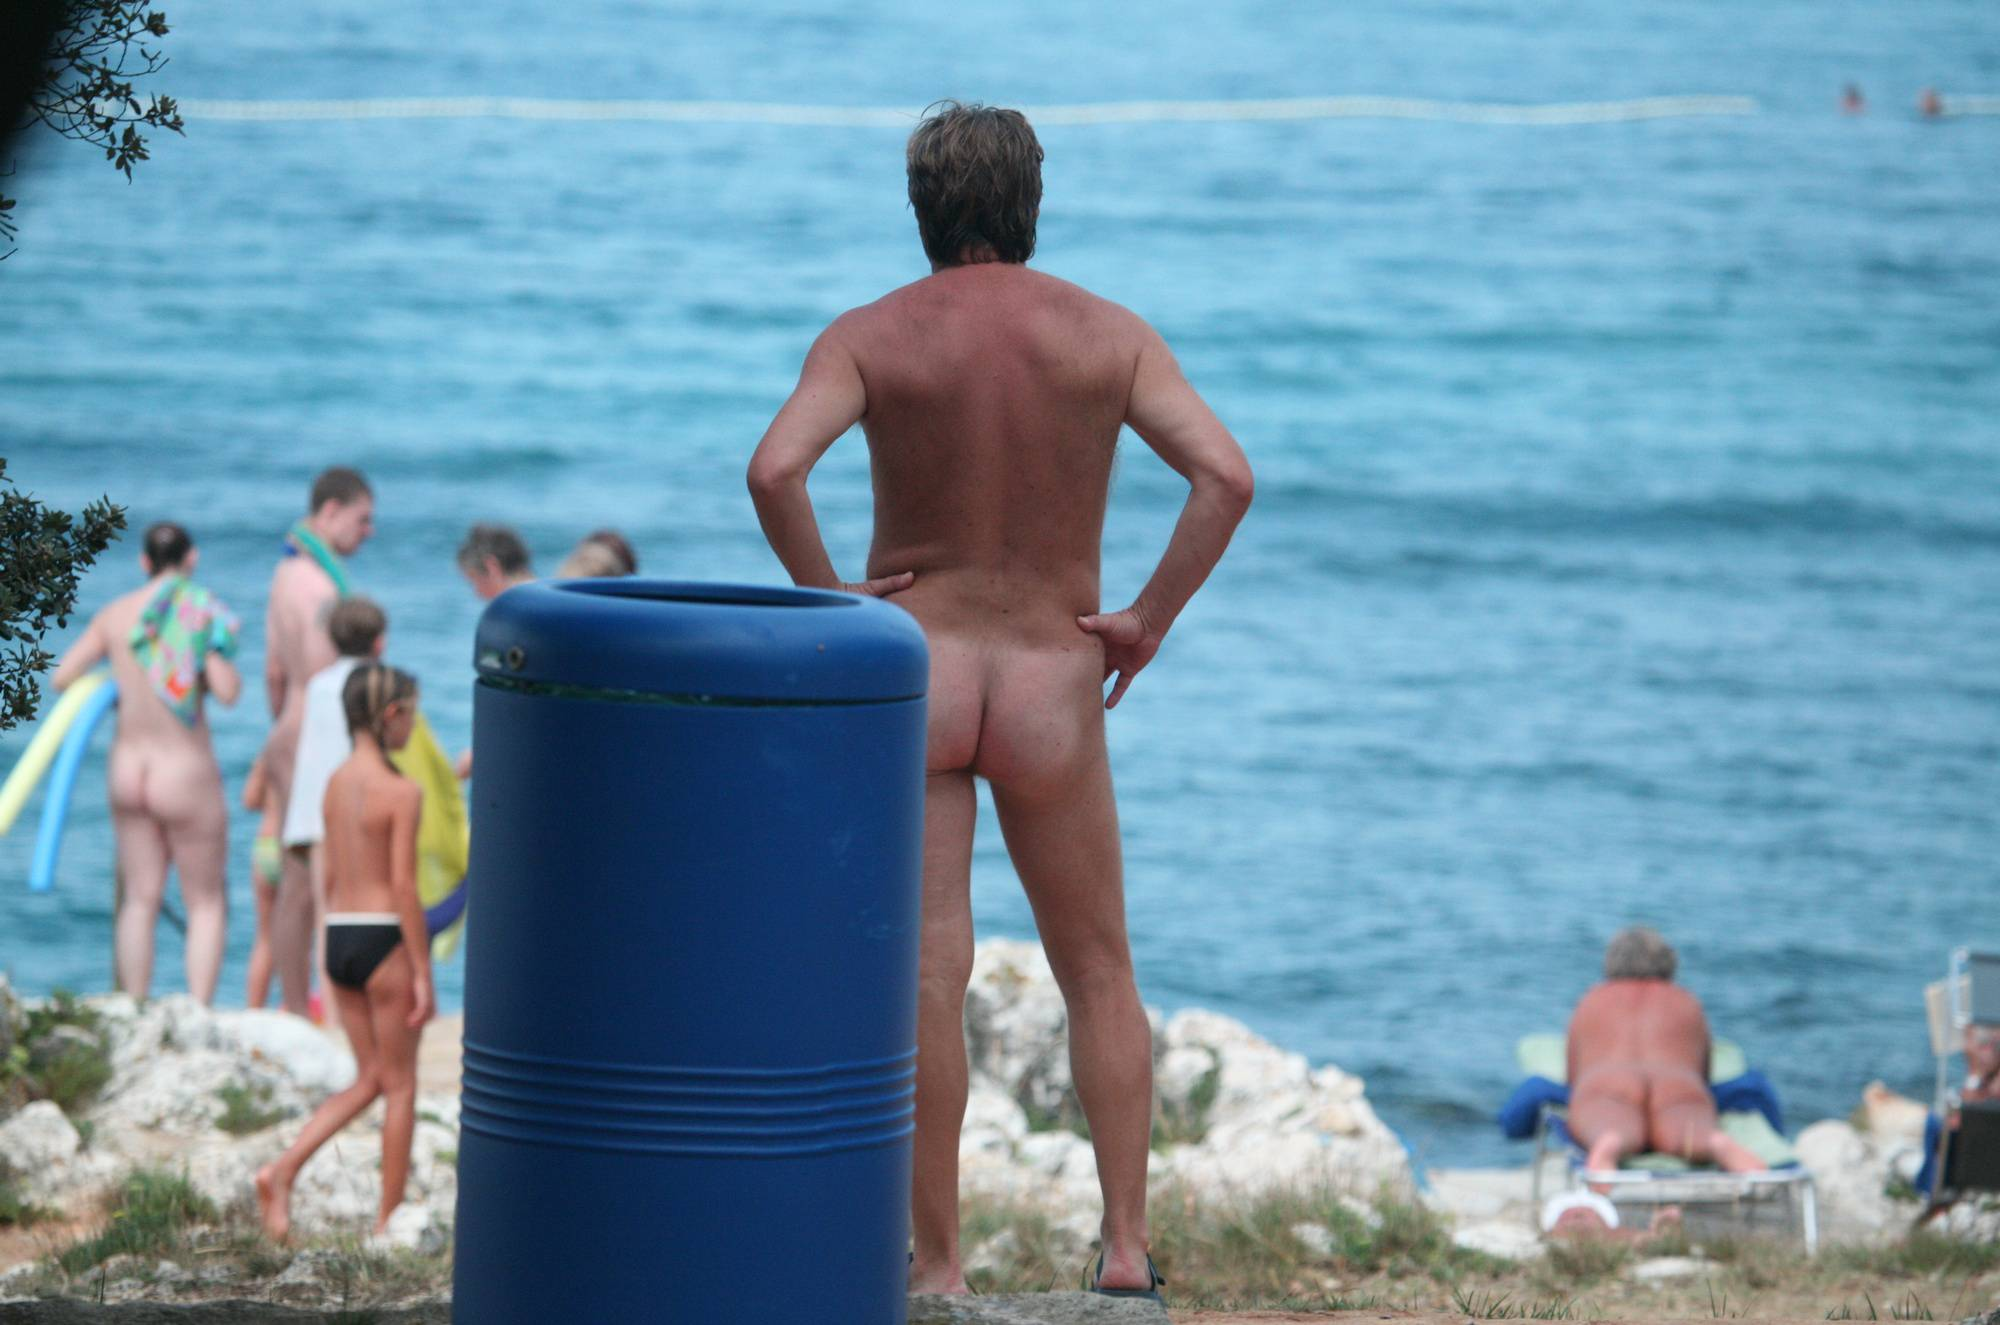 Purenudism Images Nude FKK Family Beach - 3